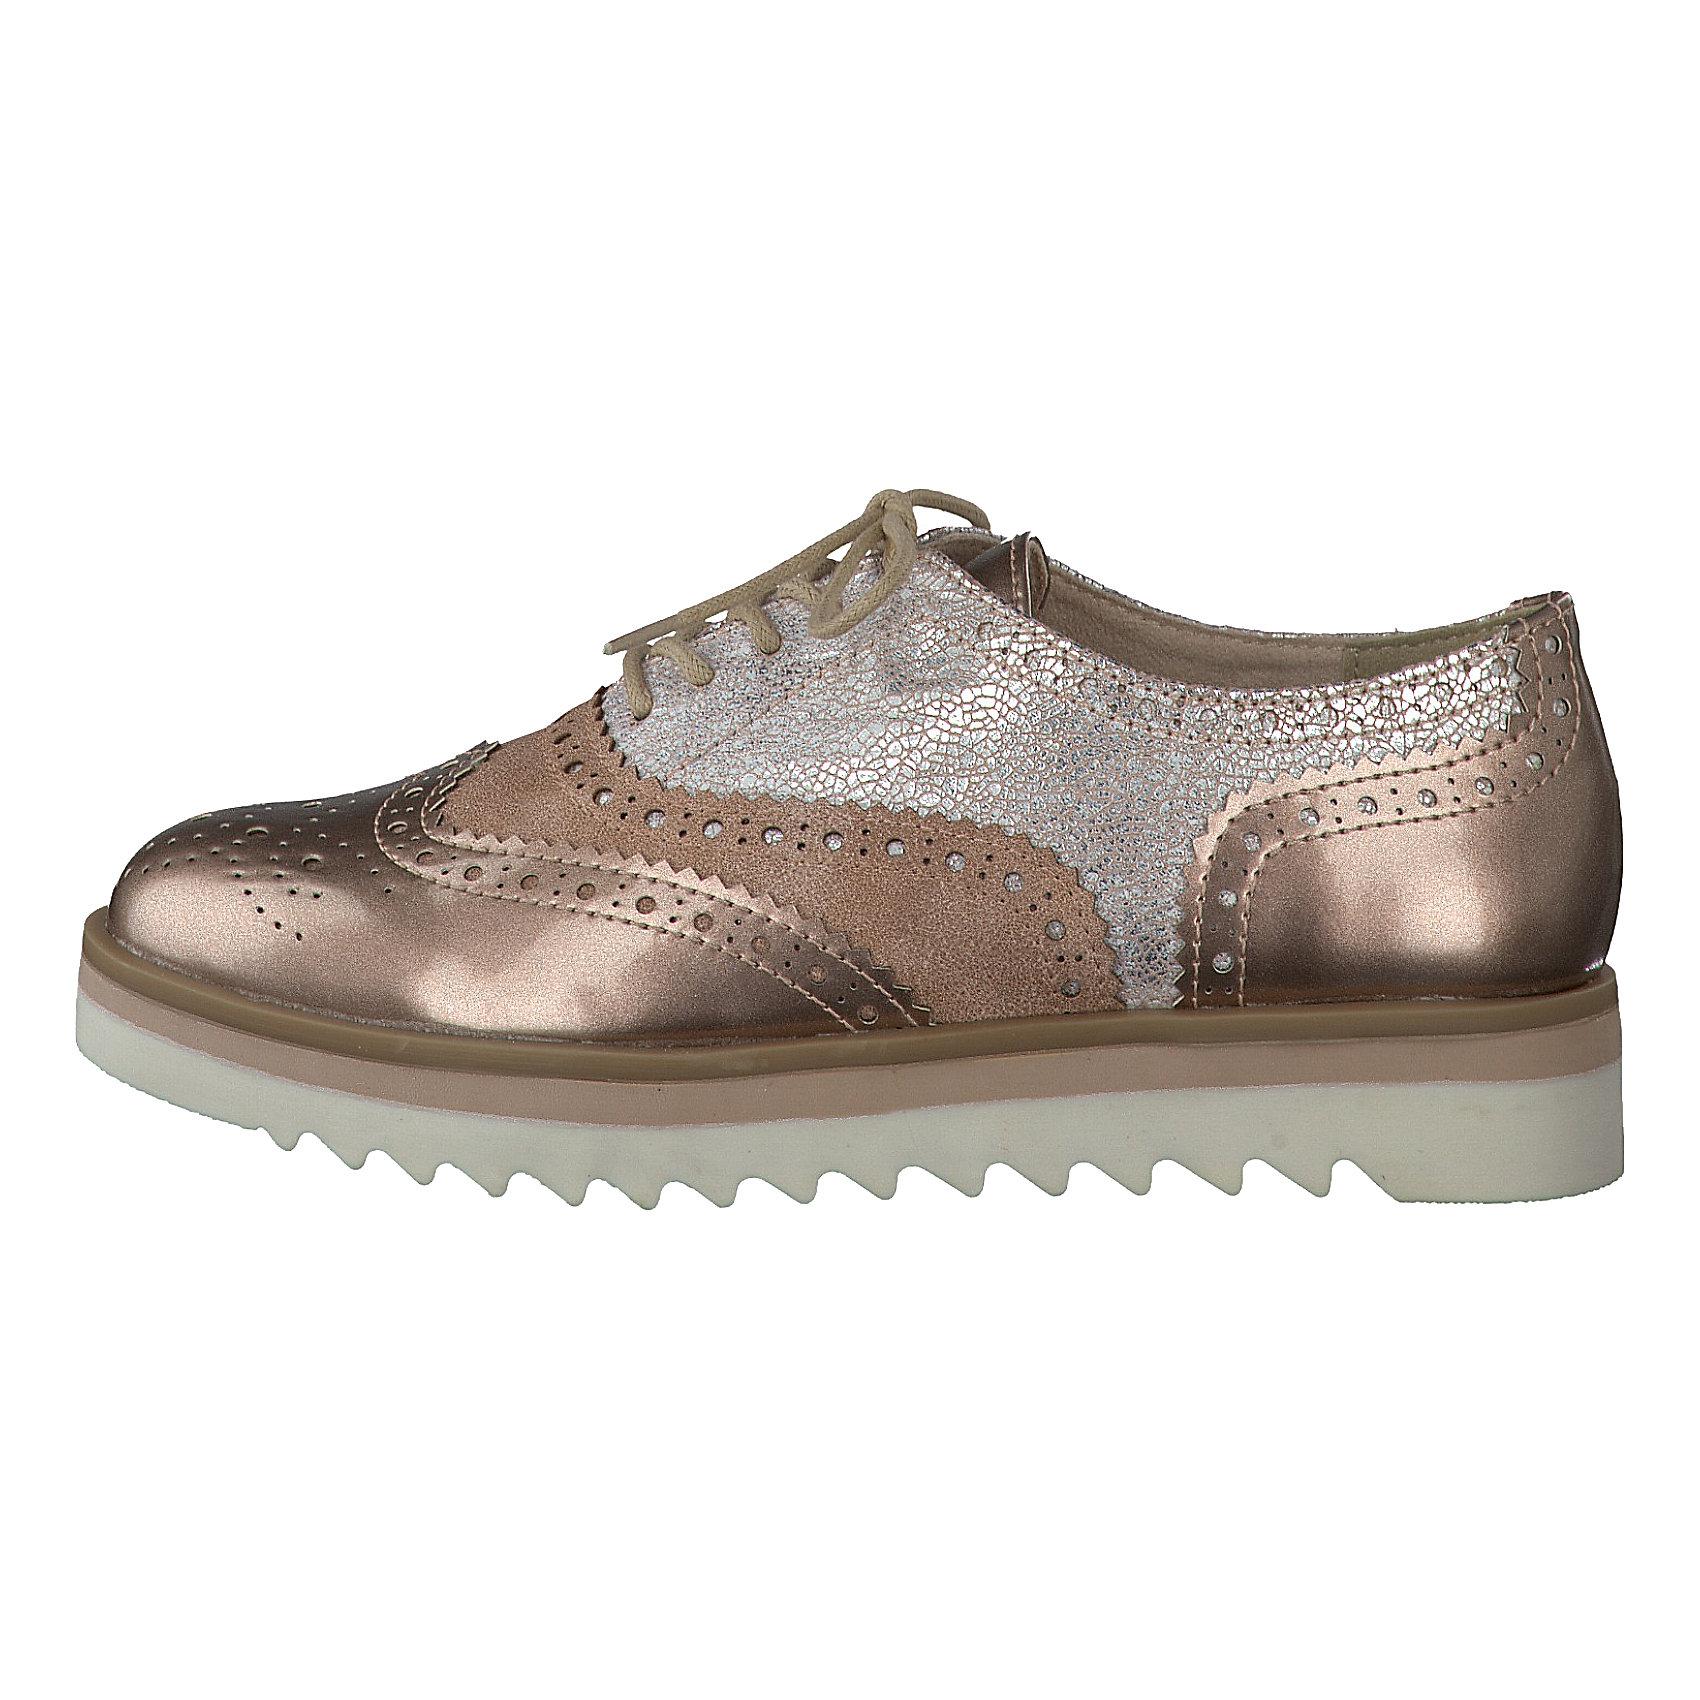 sports shoes d4e69 8ae6a Details zu Neu MARCO TOZZI Loka Halbschuhe 5765805 für Damen kupfer